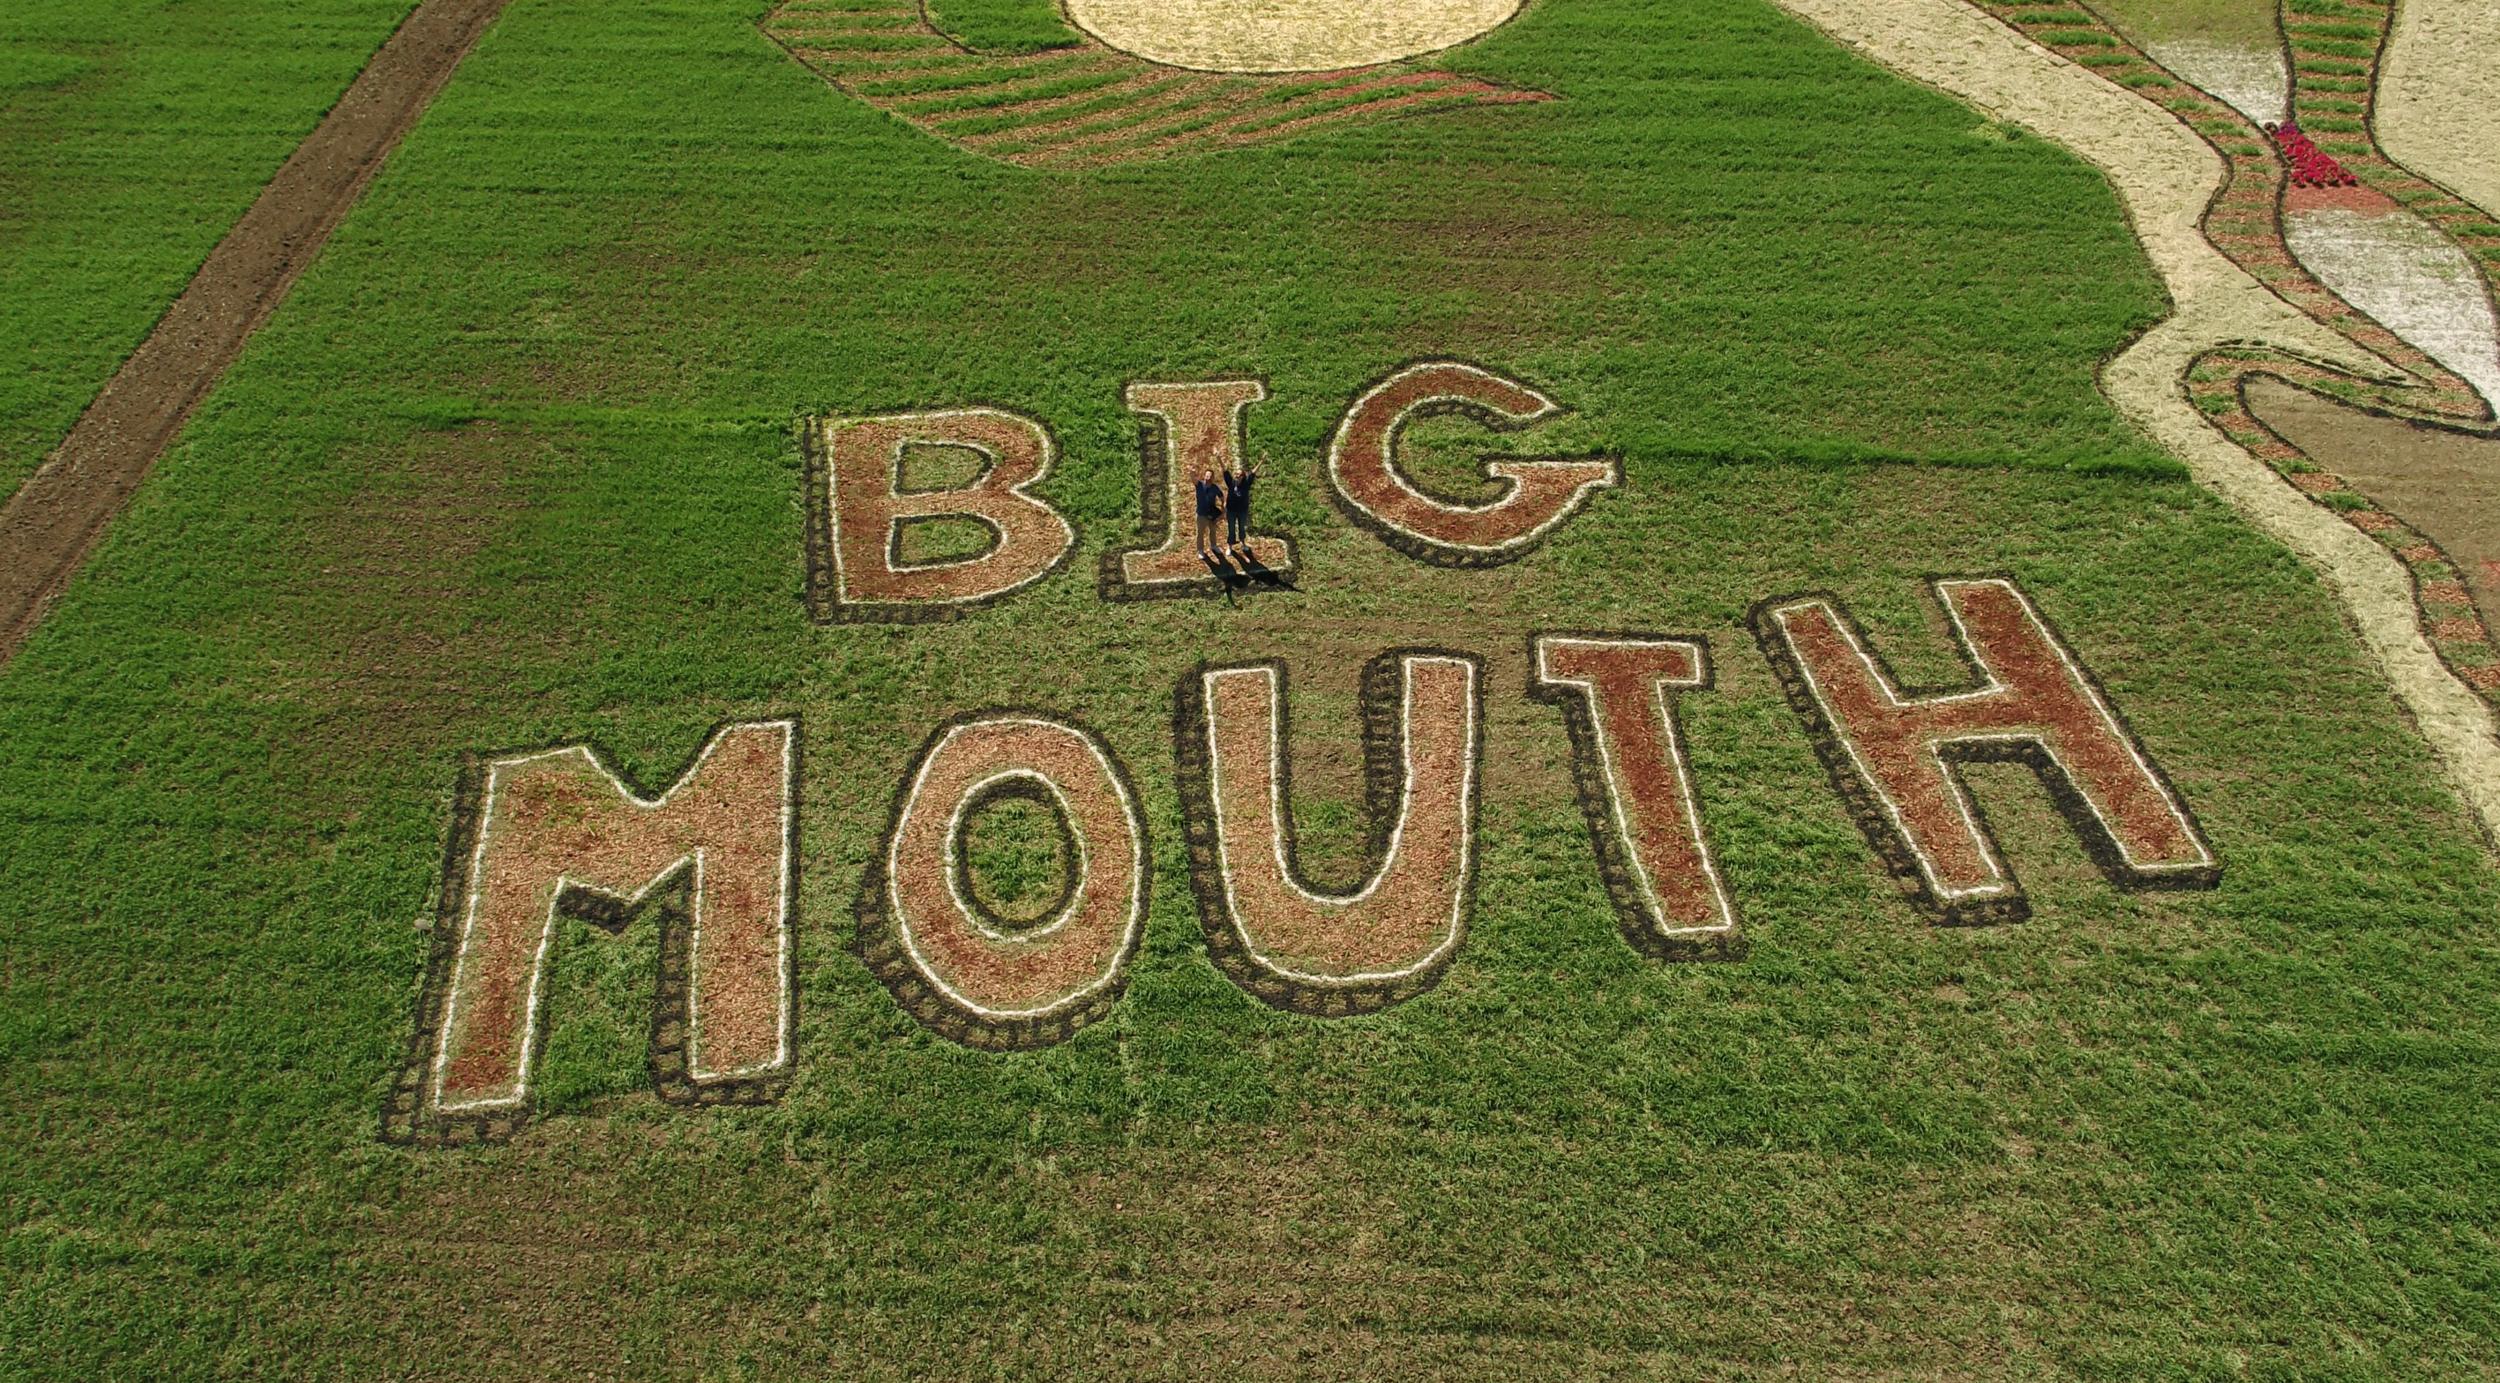 Big Mouth_North Star Aerial_Netflix